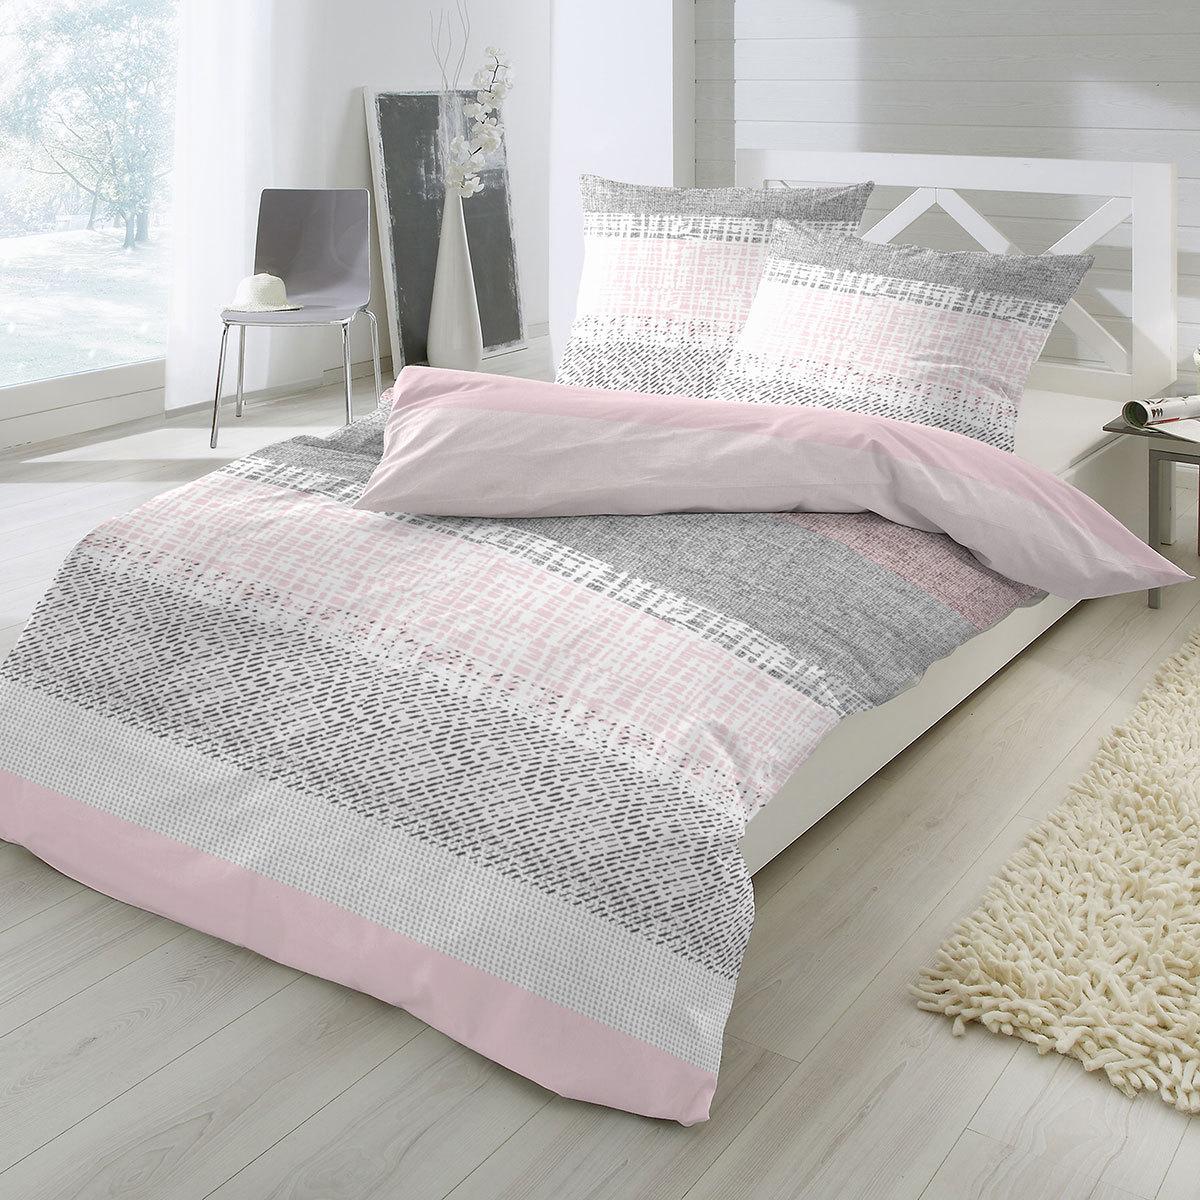 enrico coss edelflanell bettw sche venice rose g nstig online kaufen bei bettwaren shop. Black Bedroom Furniture Sets. Home Design Ideas